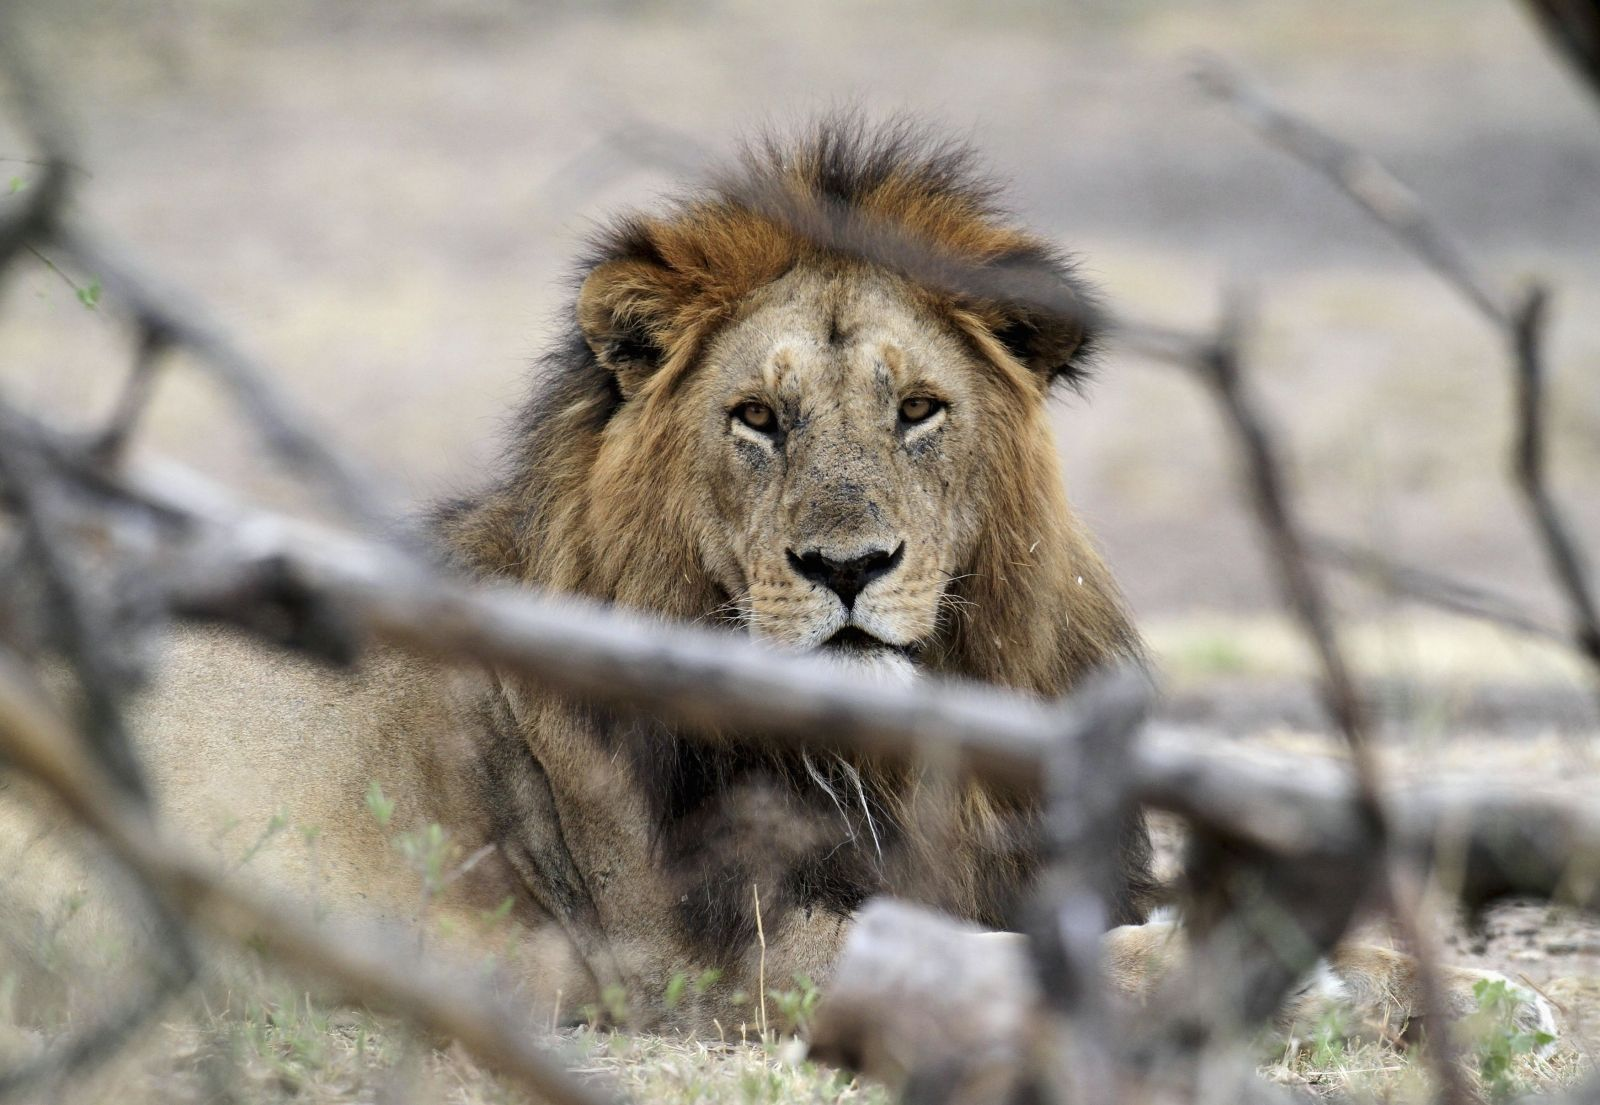 Lion Trophy Hunting